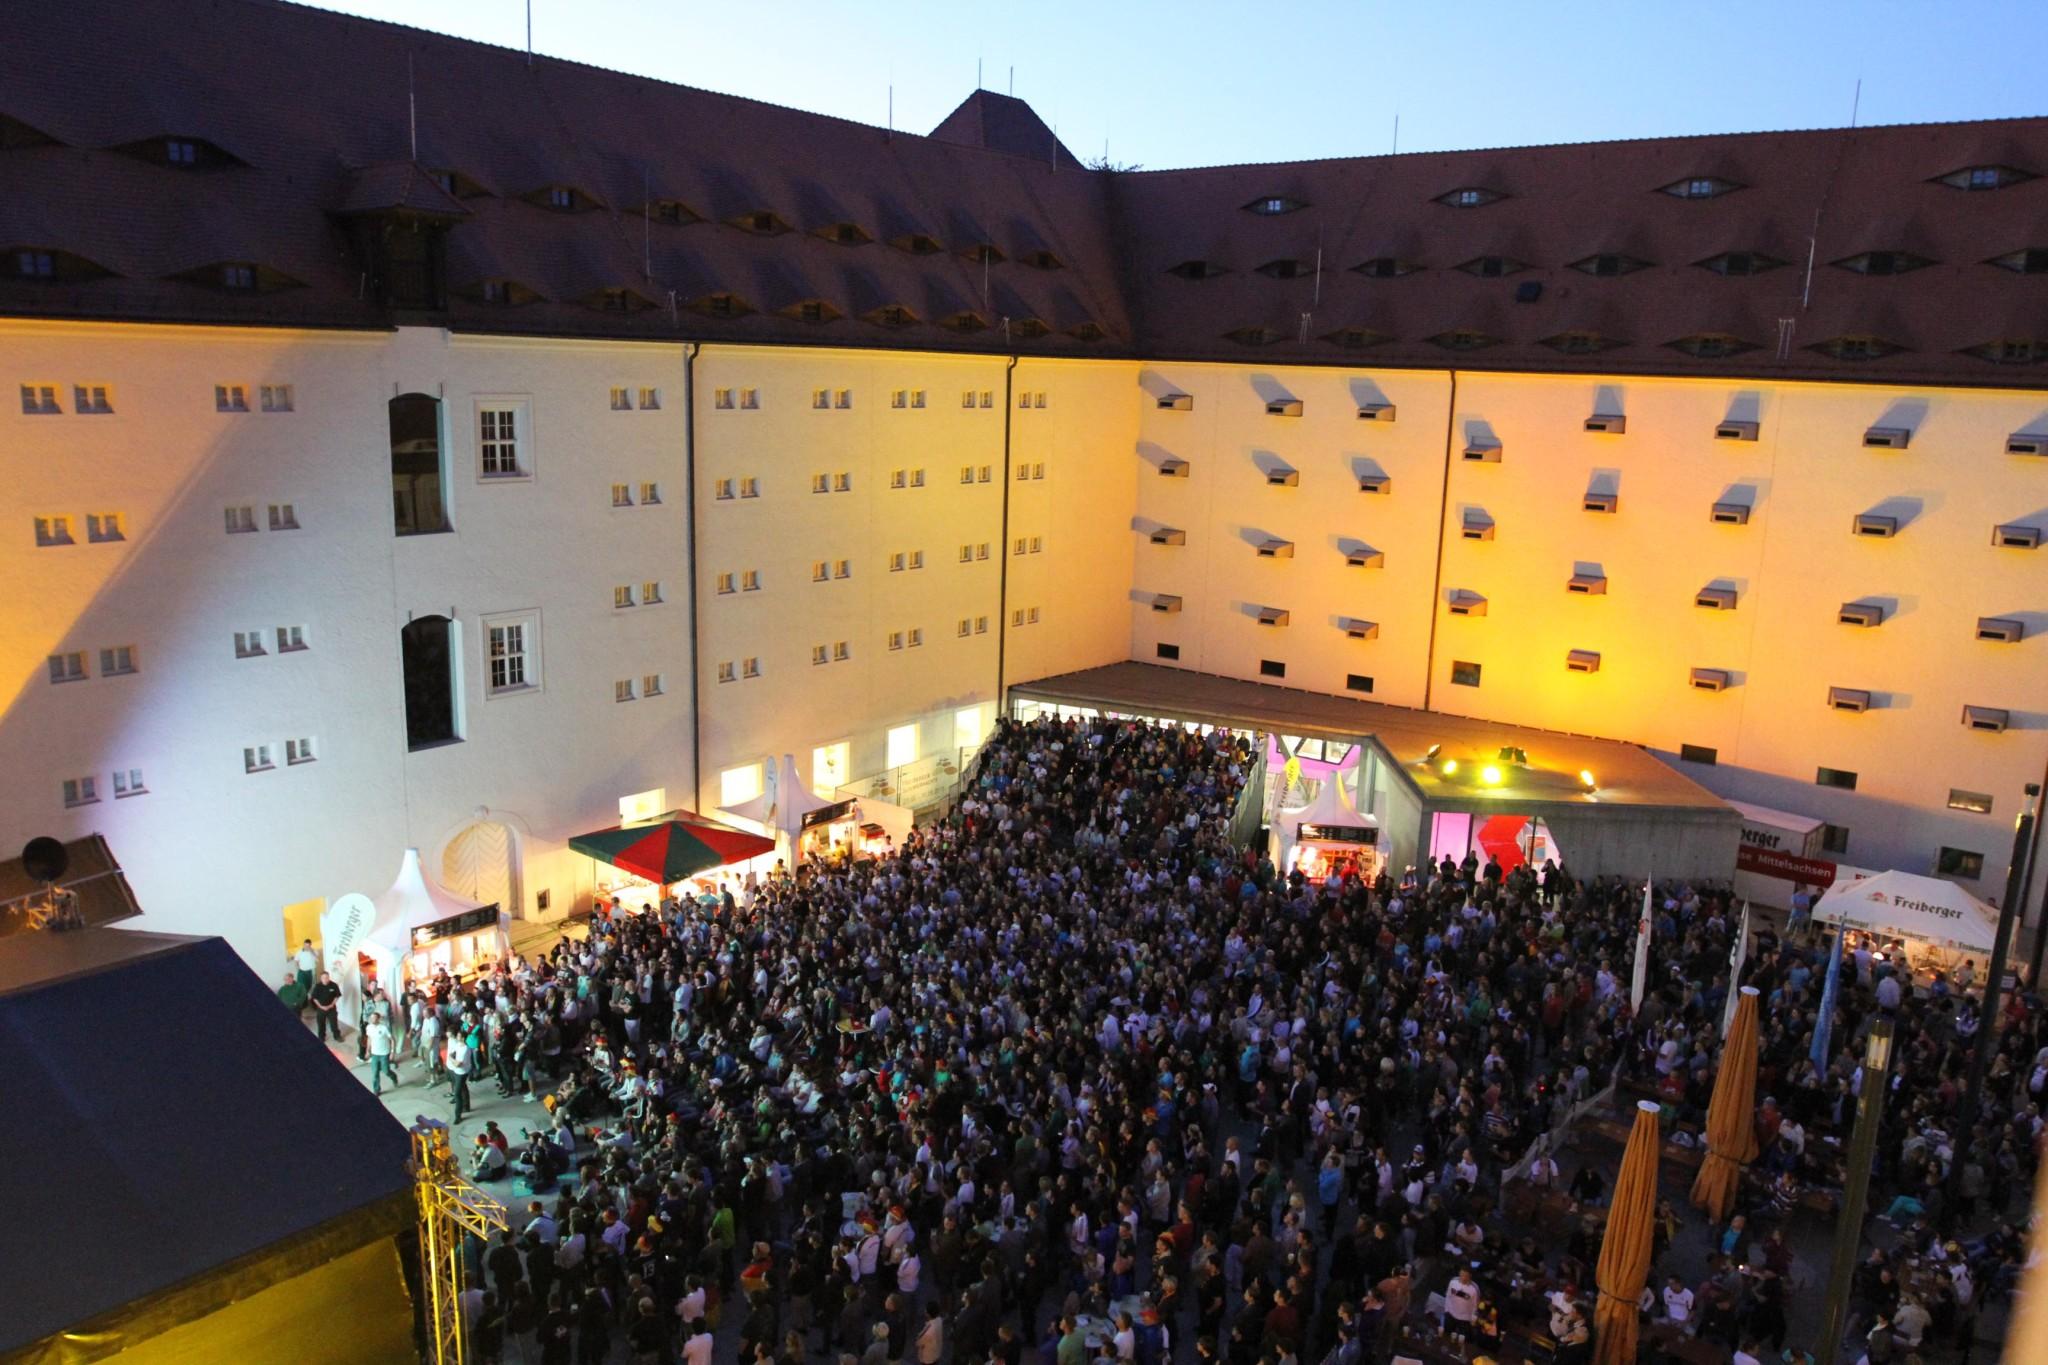 Kino Freiberg